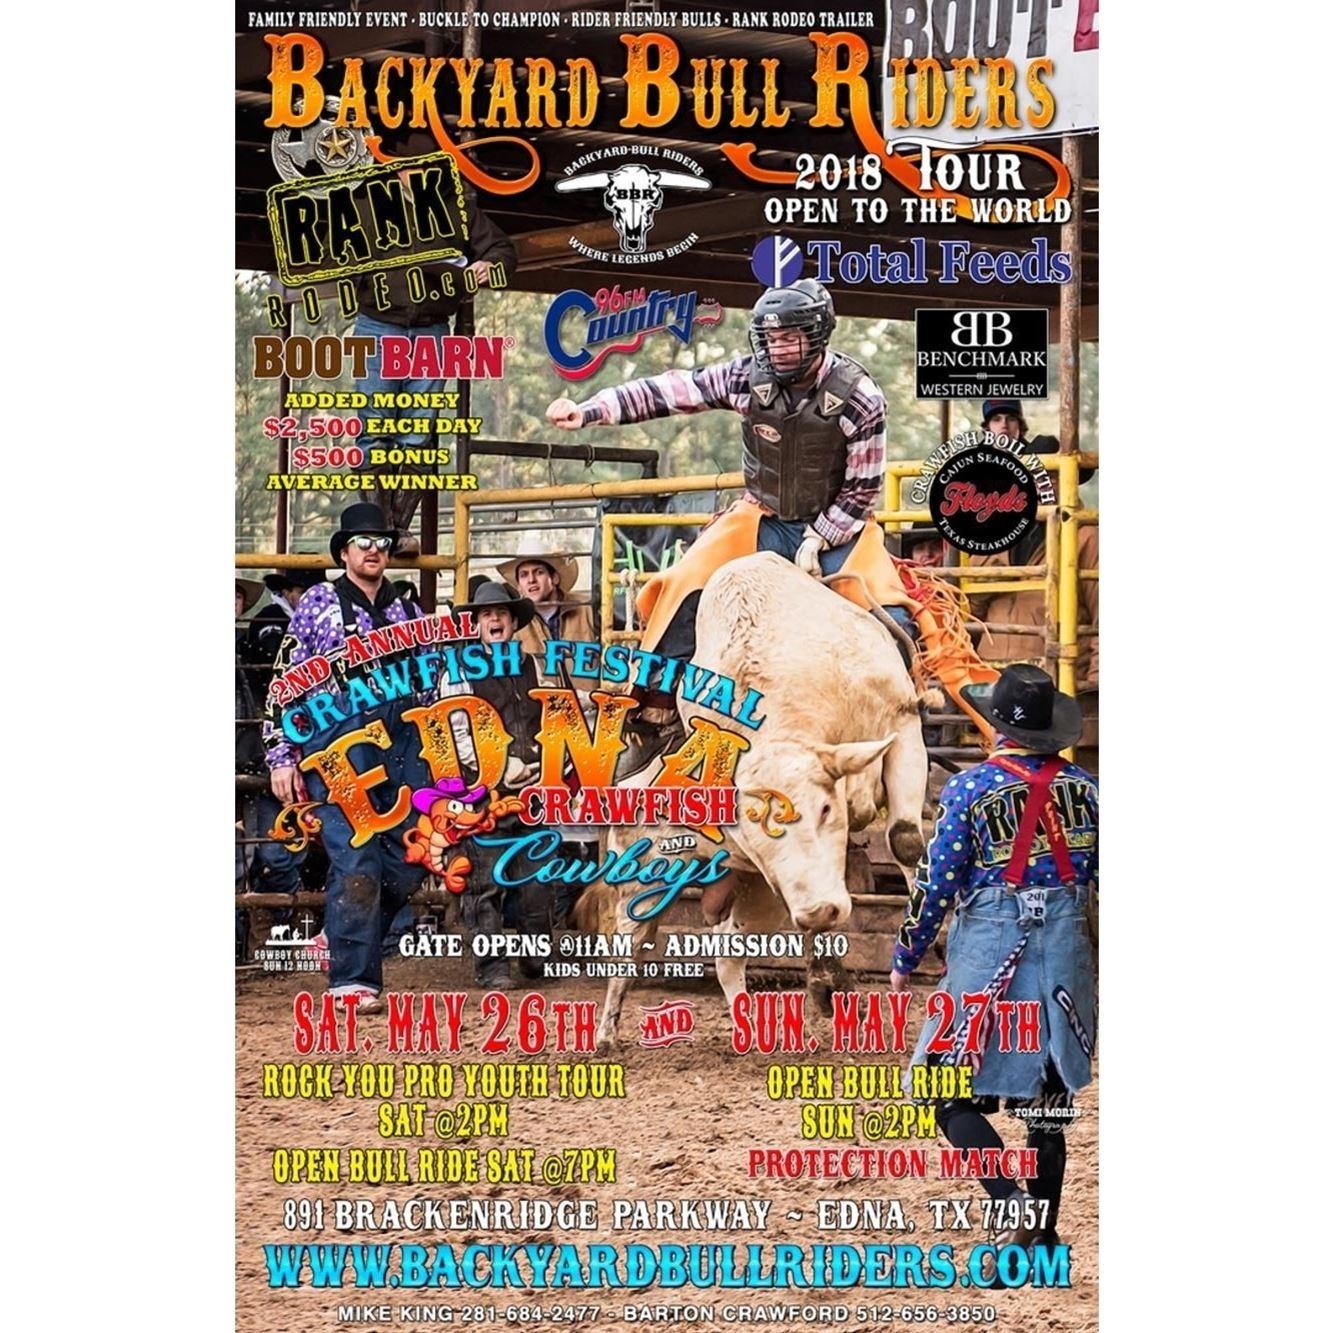 RANK Rodeo Bull Riding & Crawfish Festival